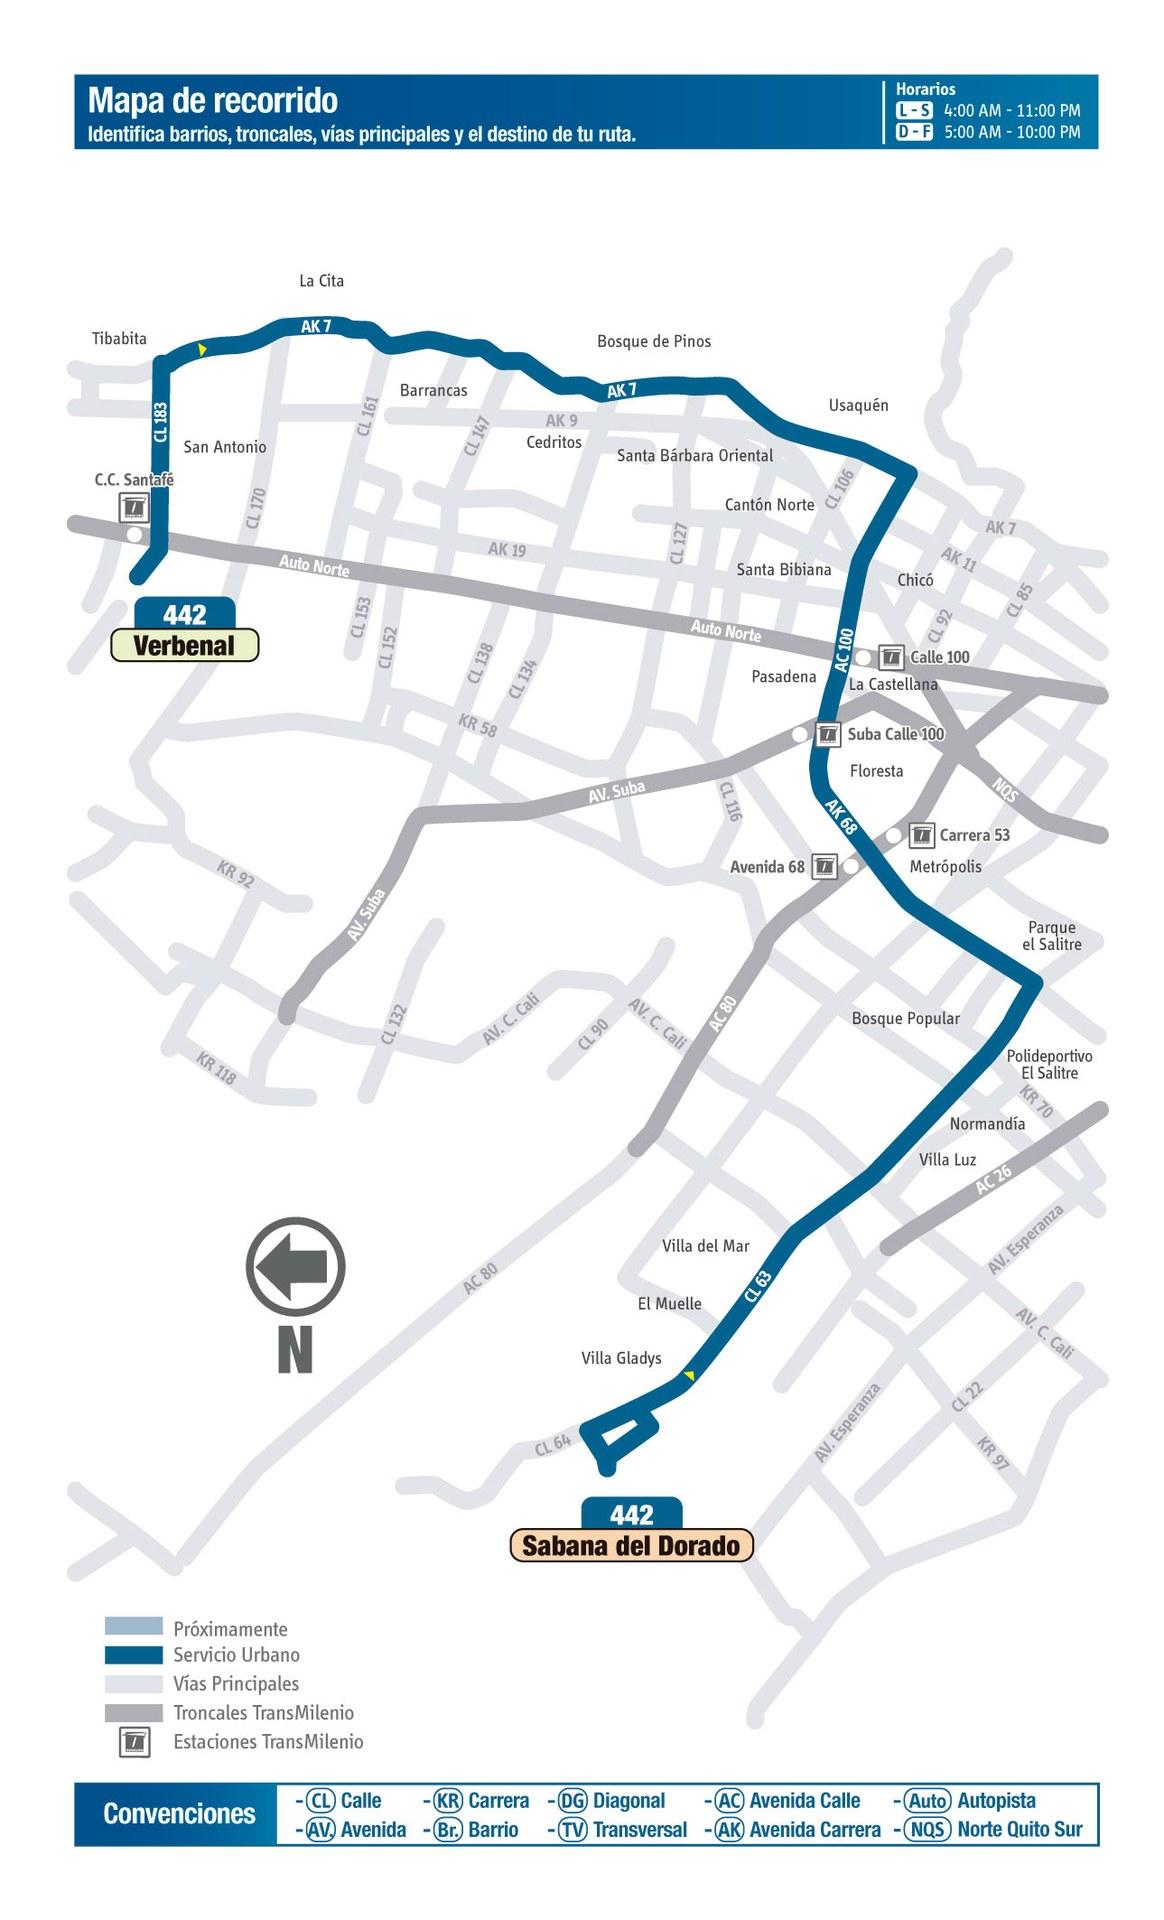 Ruta SITP: 442 Sabana del Dorado ↔ Verbenal [Urbana] 4